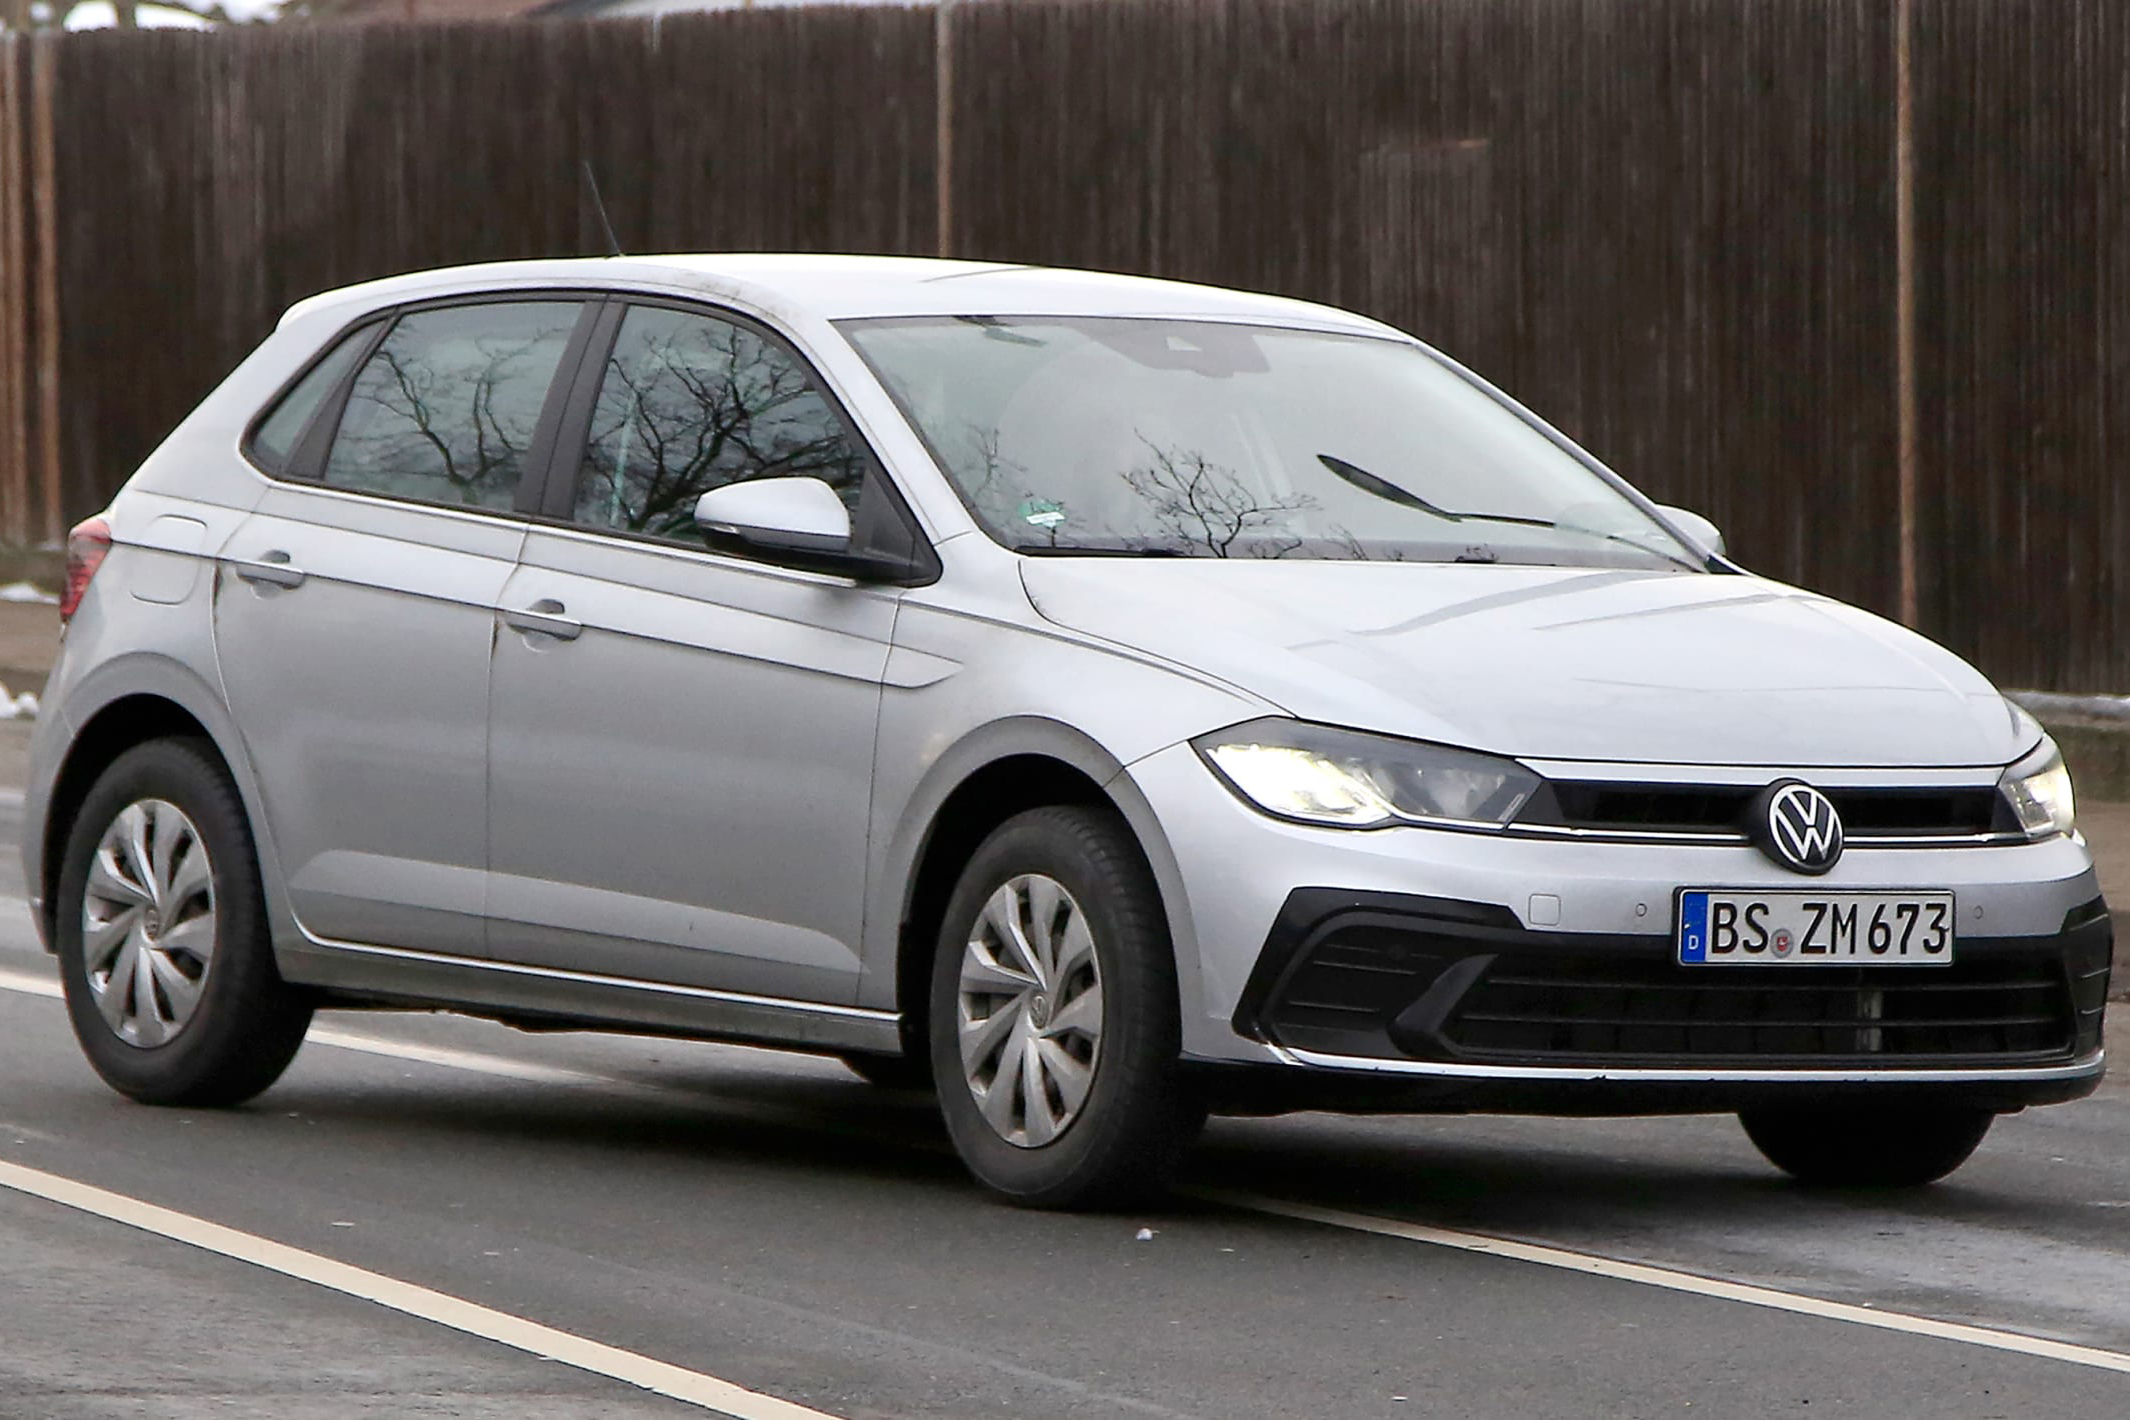 Volkswagen-Polo-2021-spy-4.jpg